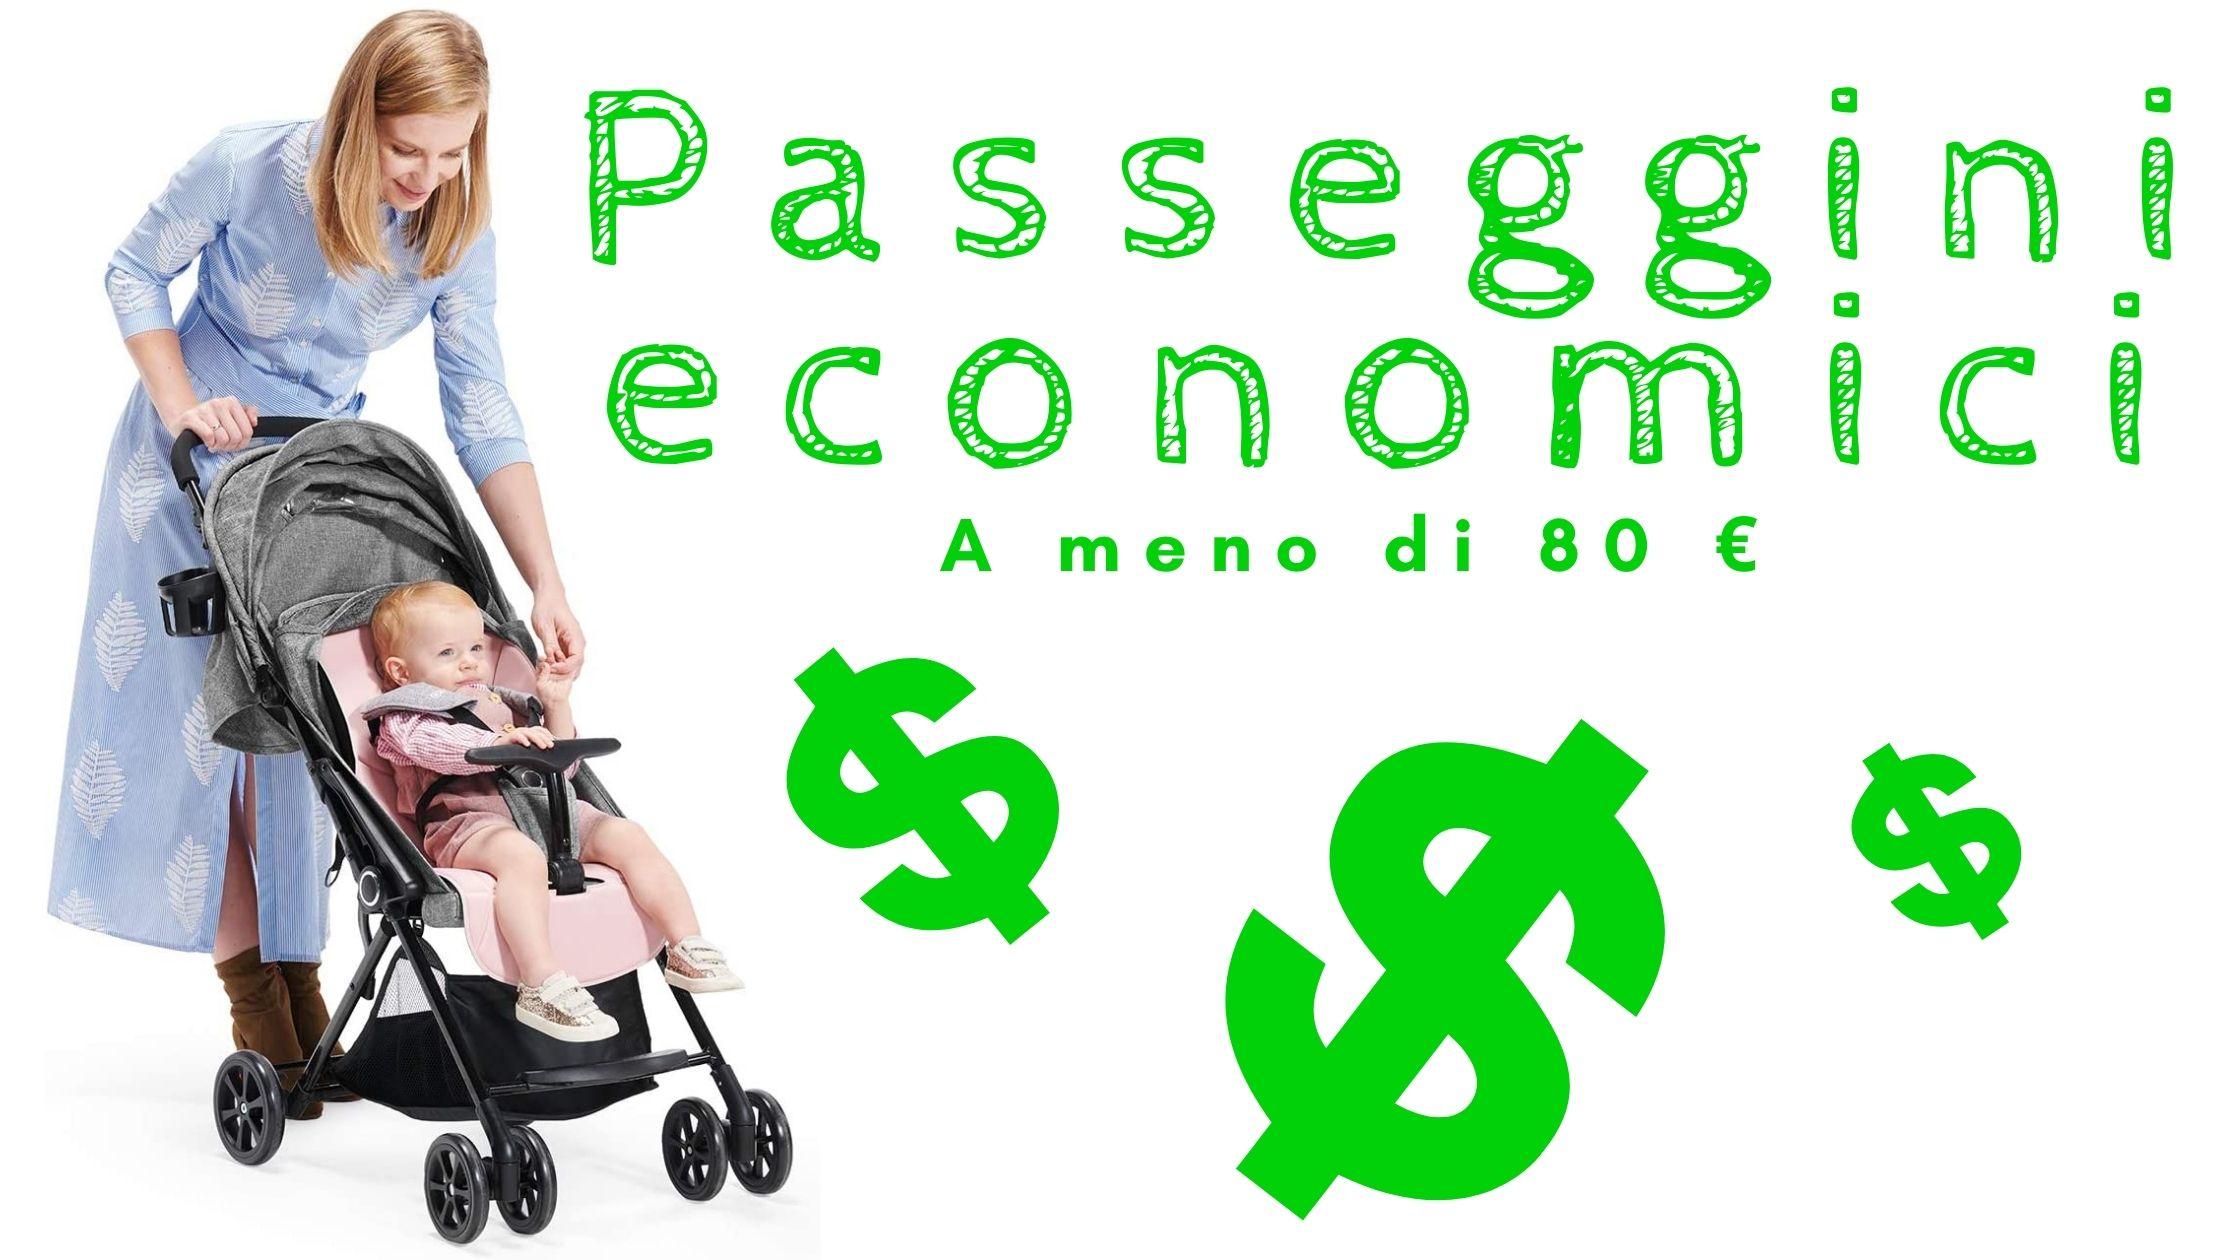 Passeggini economici